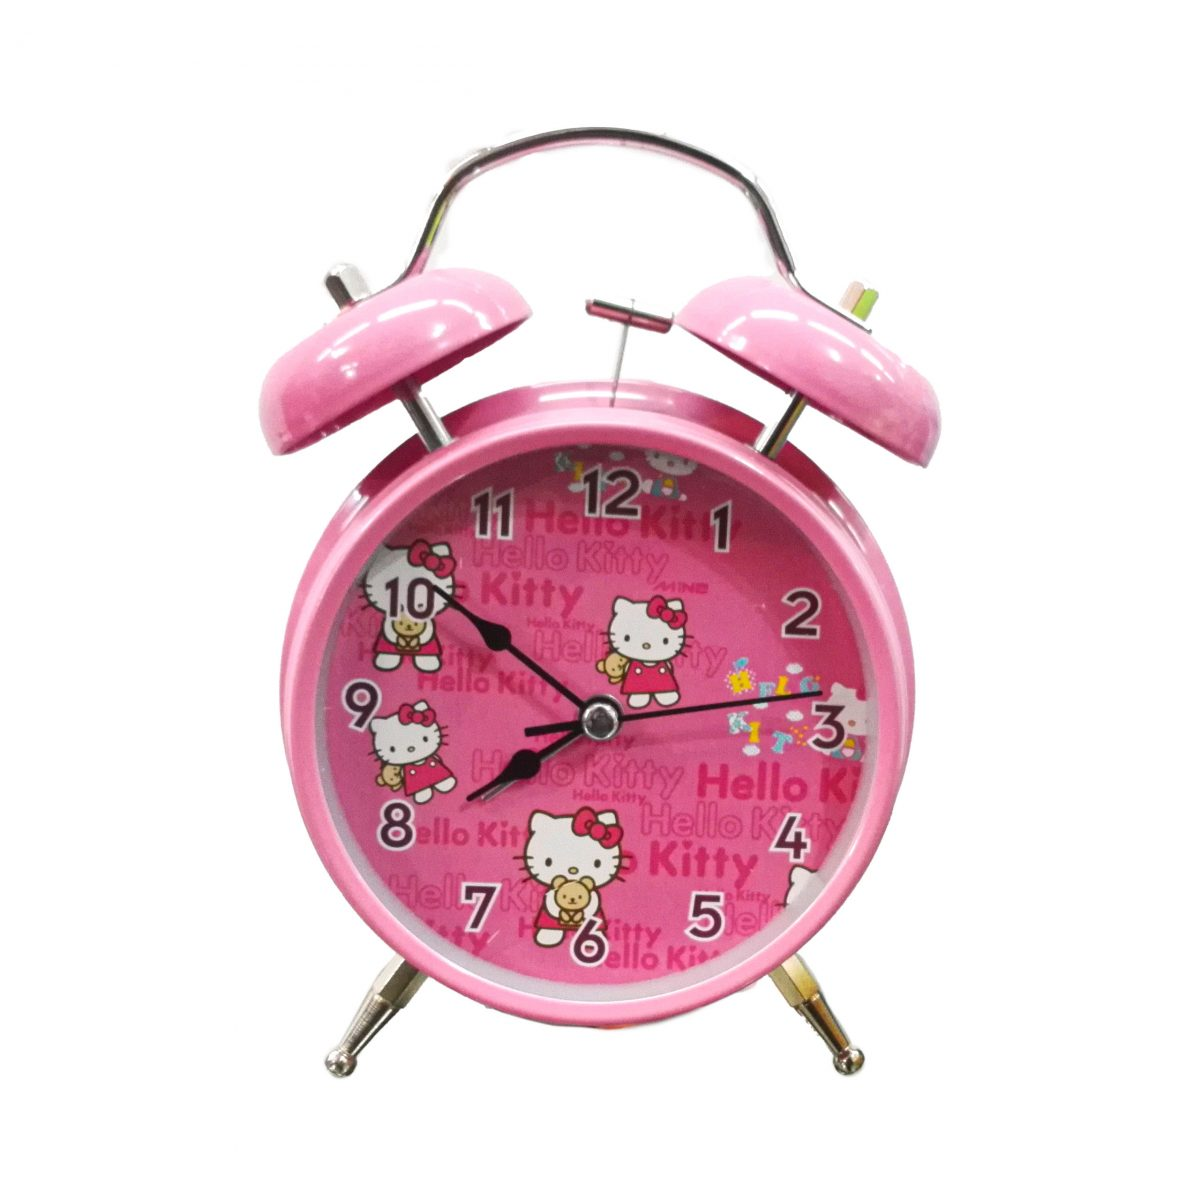 ساعت شخصیتی شماته دار کیتی